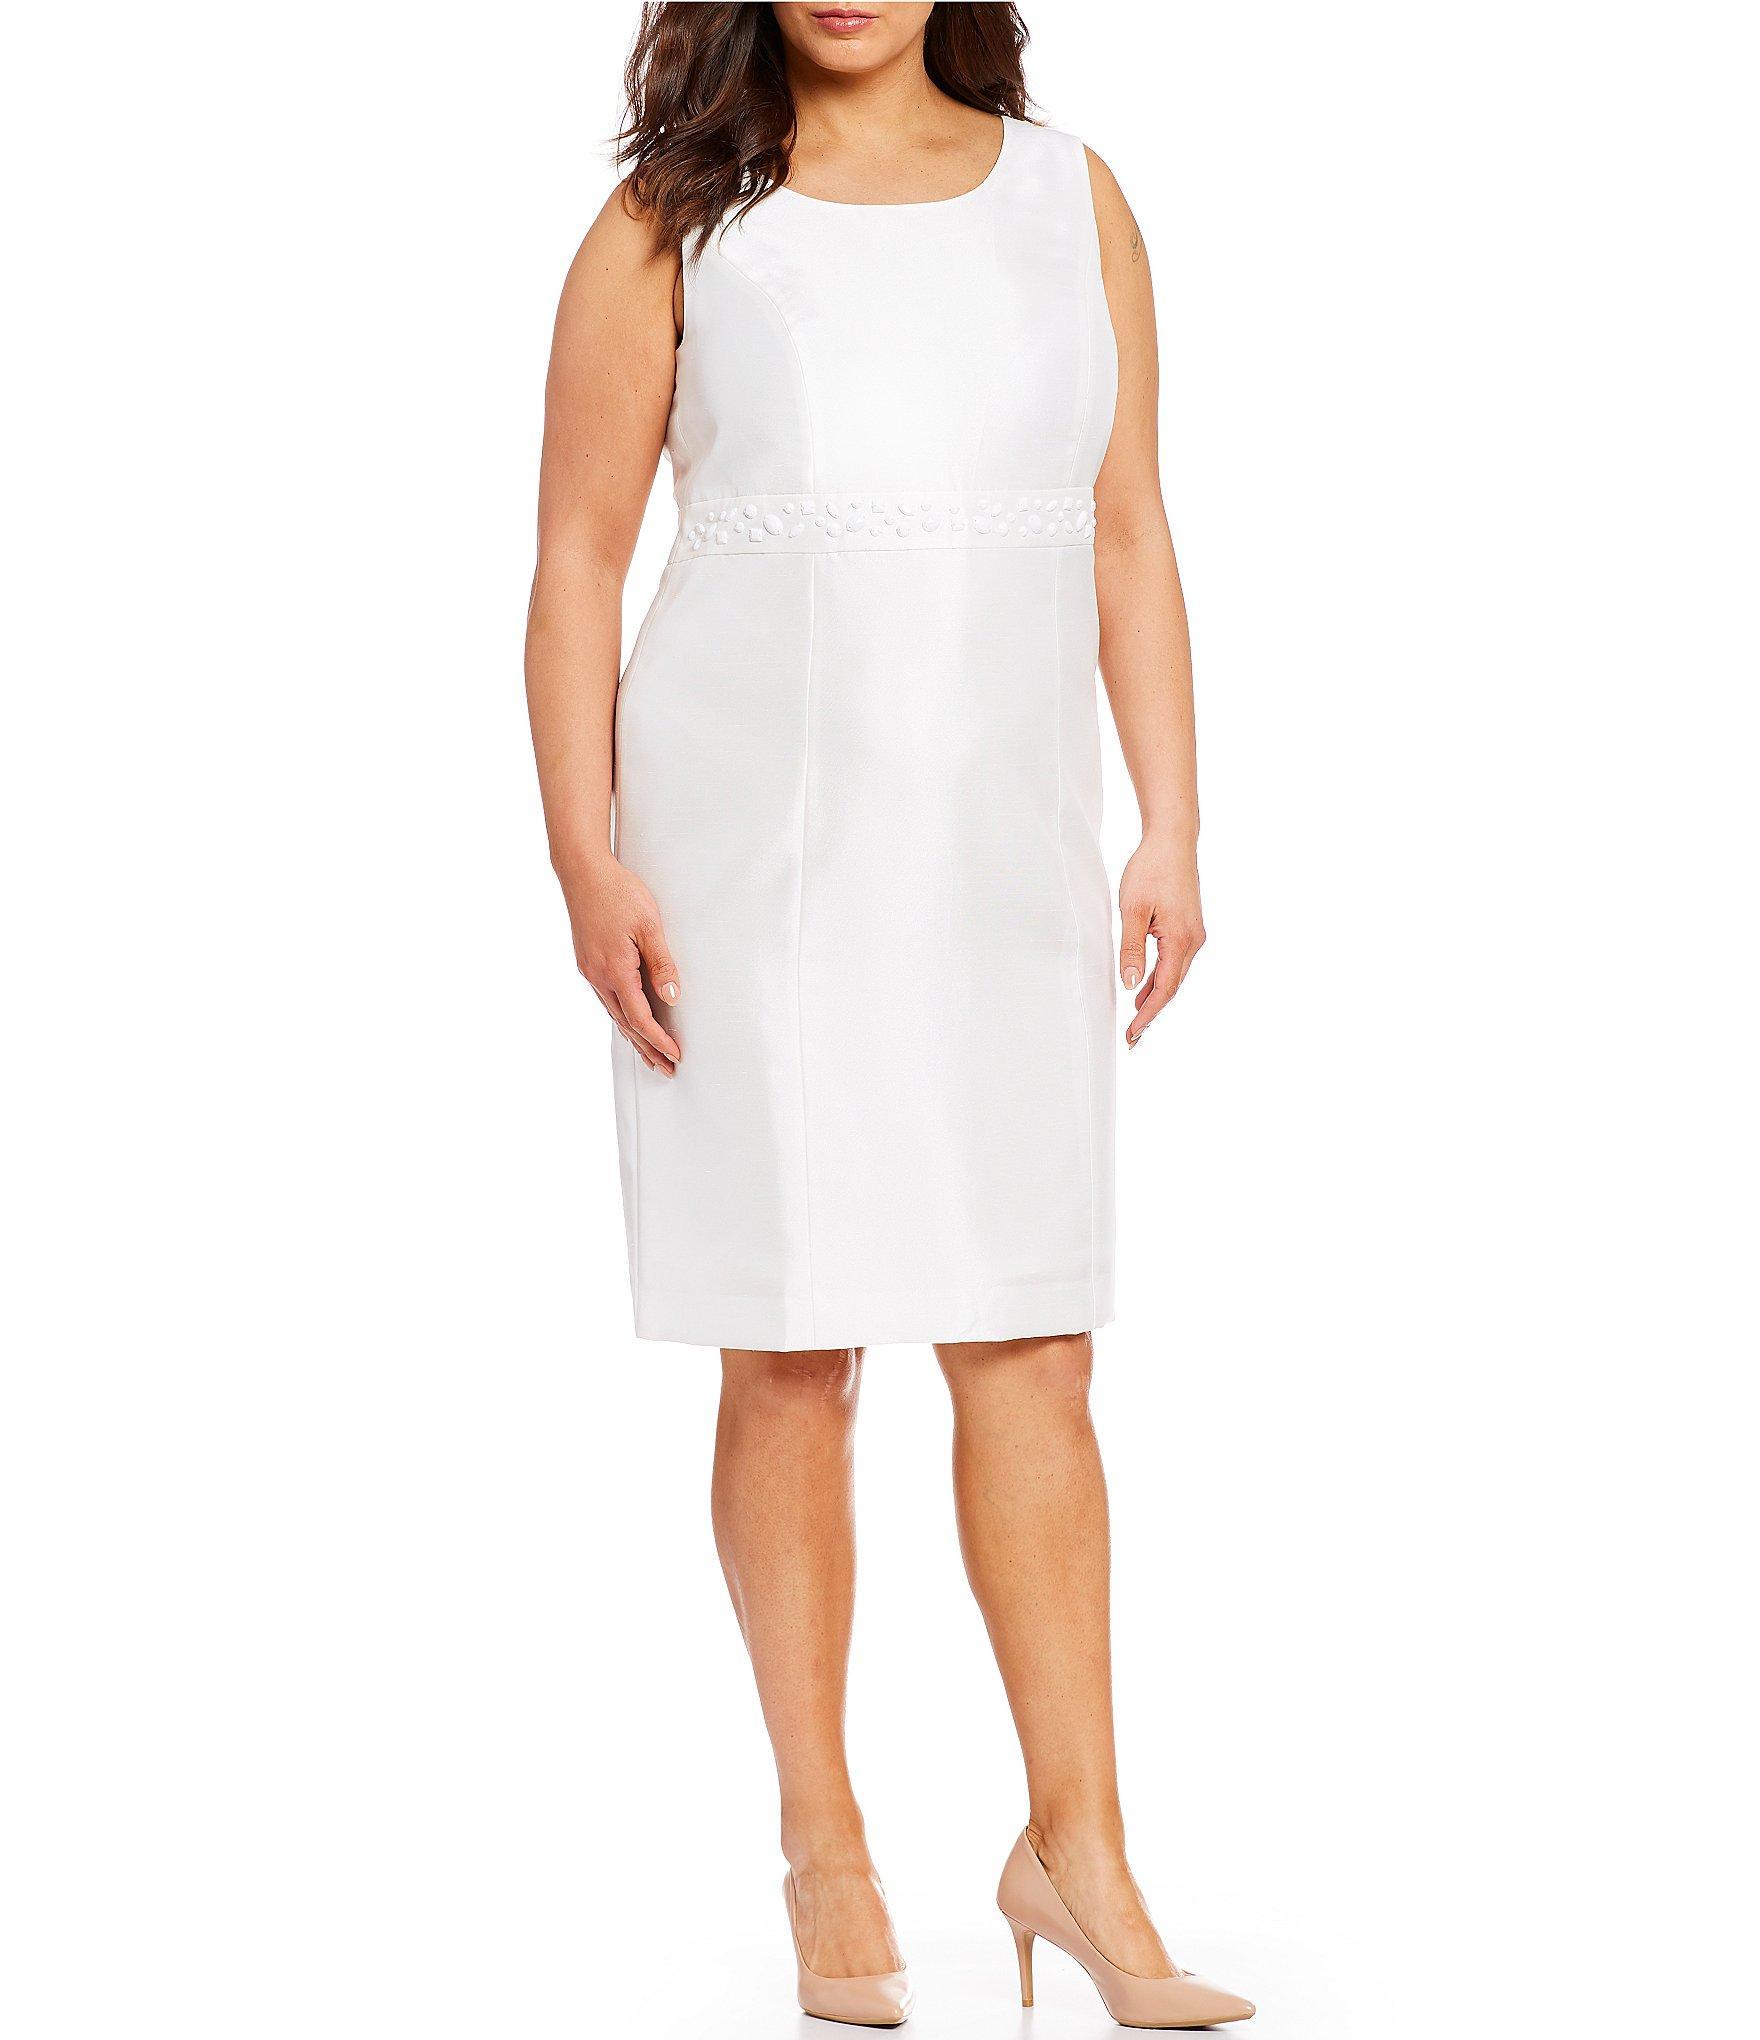 7f4b1fc6692f Lyst - Kasper Plus Size Shantung Embellished Waist Sheath Dress in White